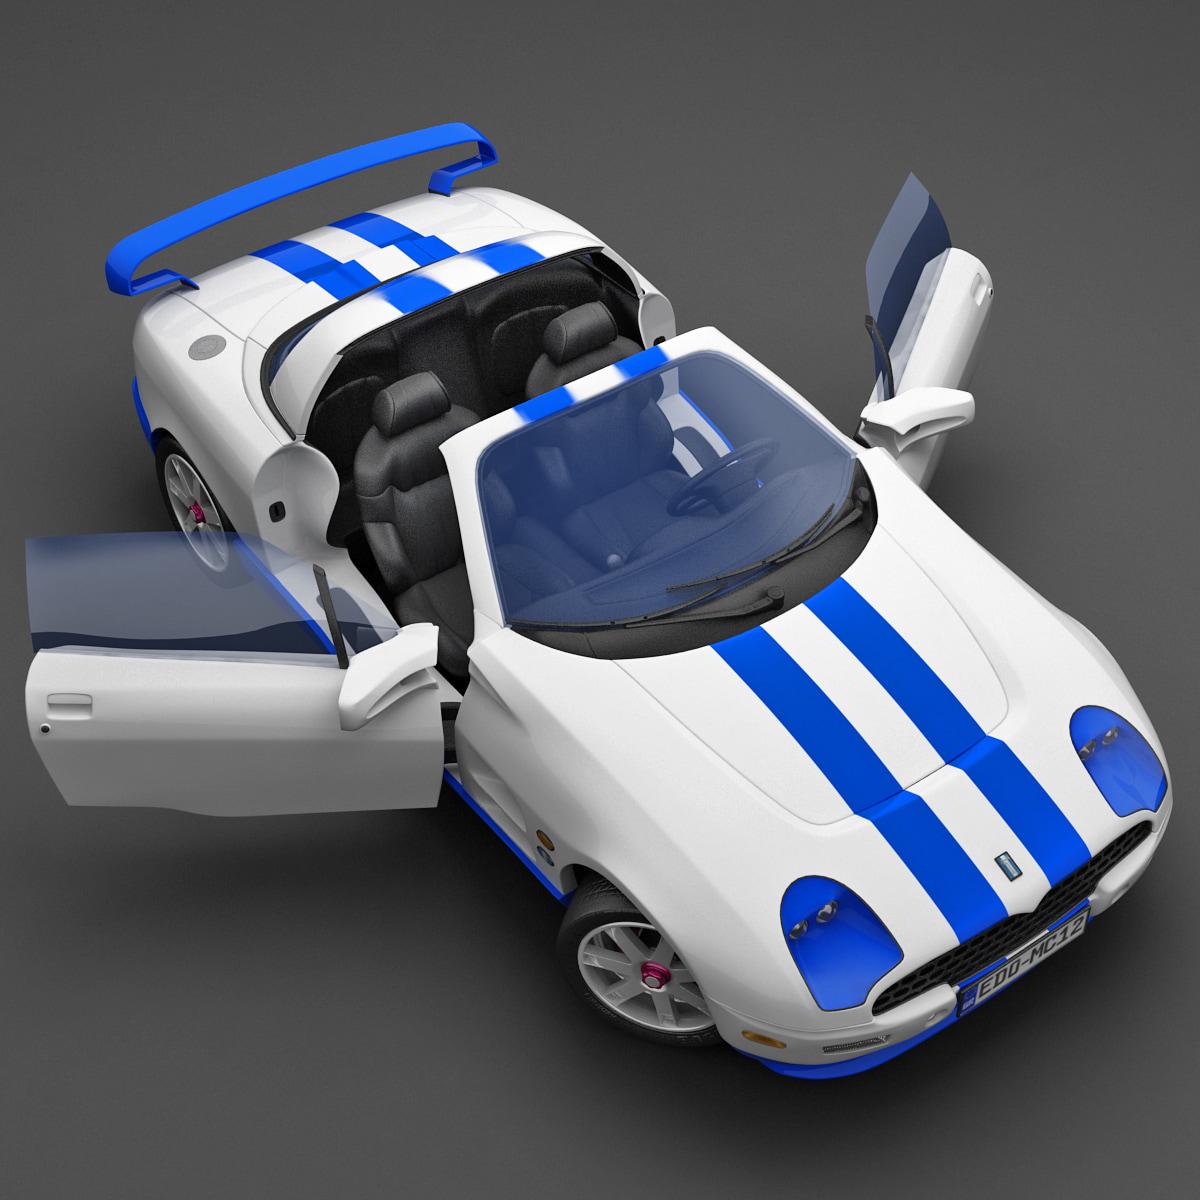 Sports_Car_De_Tomaso_Bigua_Tunned_V2_rigged_0001.jpg